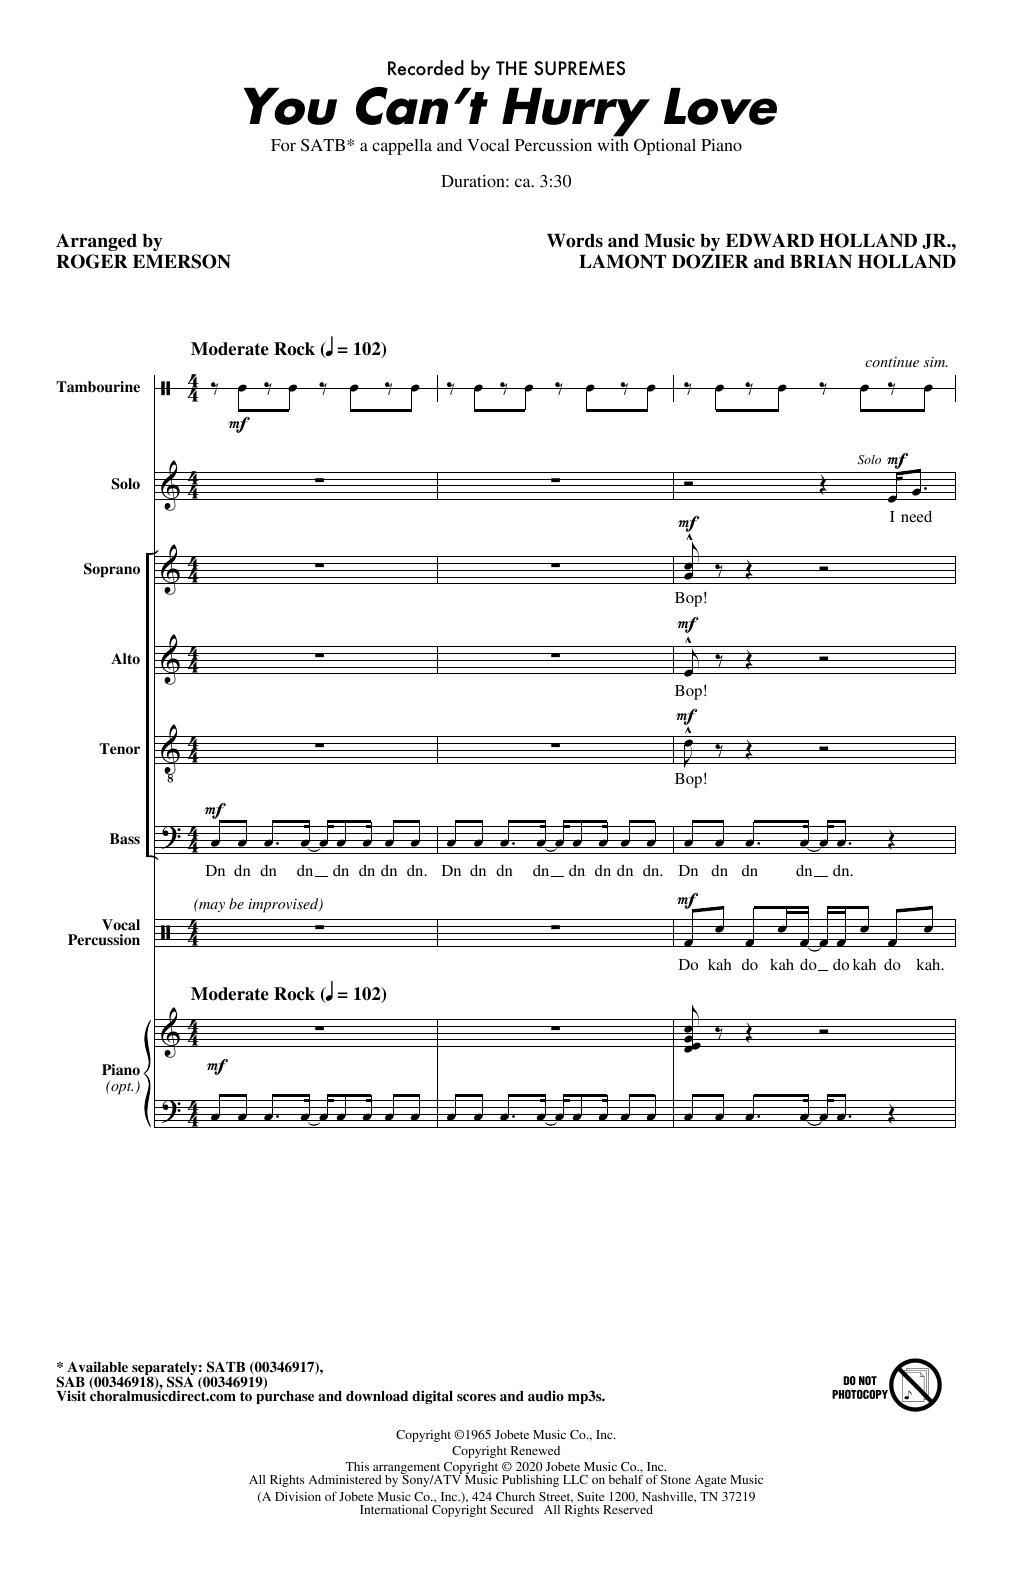 You Can't Hurry Love (arr. Roger Emerson) (SATB Choir)